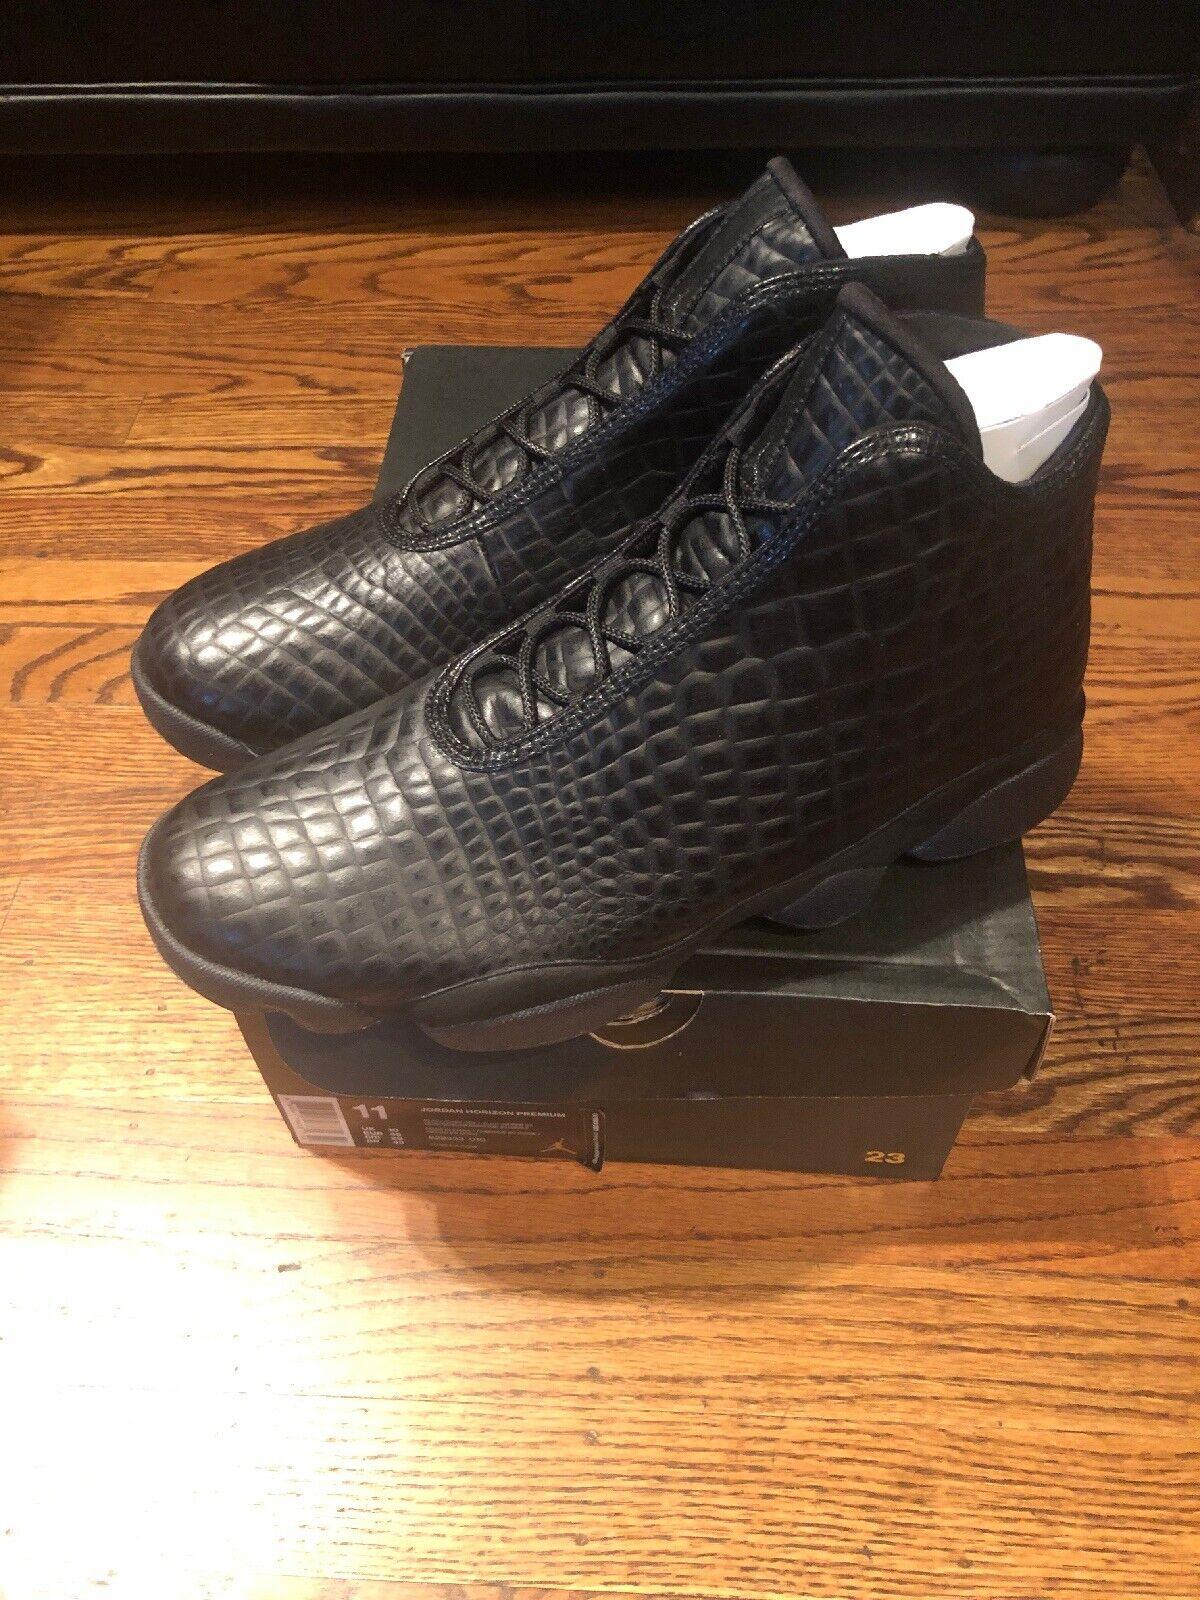 New Nike Men JORDAN HORIZON PREMIUM 822333 010 Black Size 11 Xiii 13